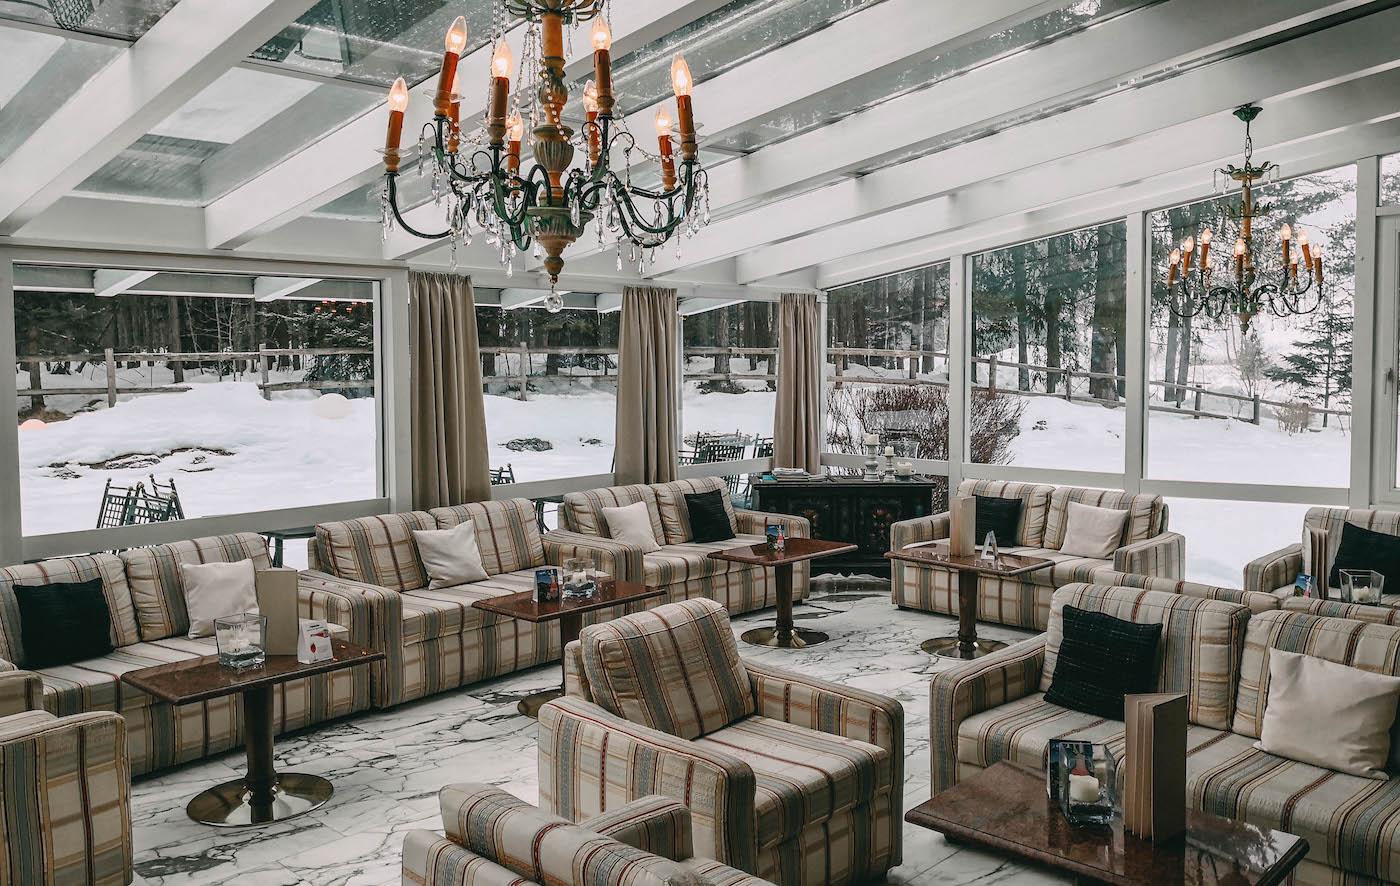 Mieminger Plateau Hotel Kaysers Tirolresort Innsbruck